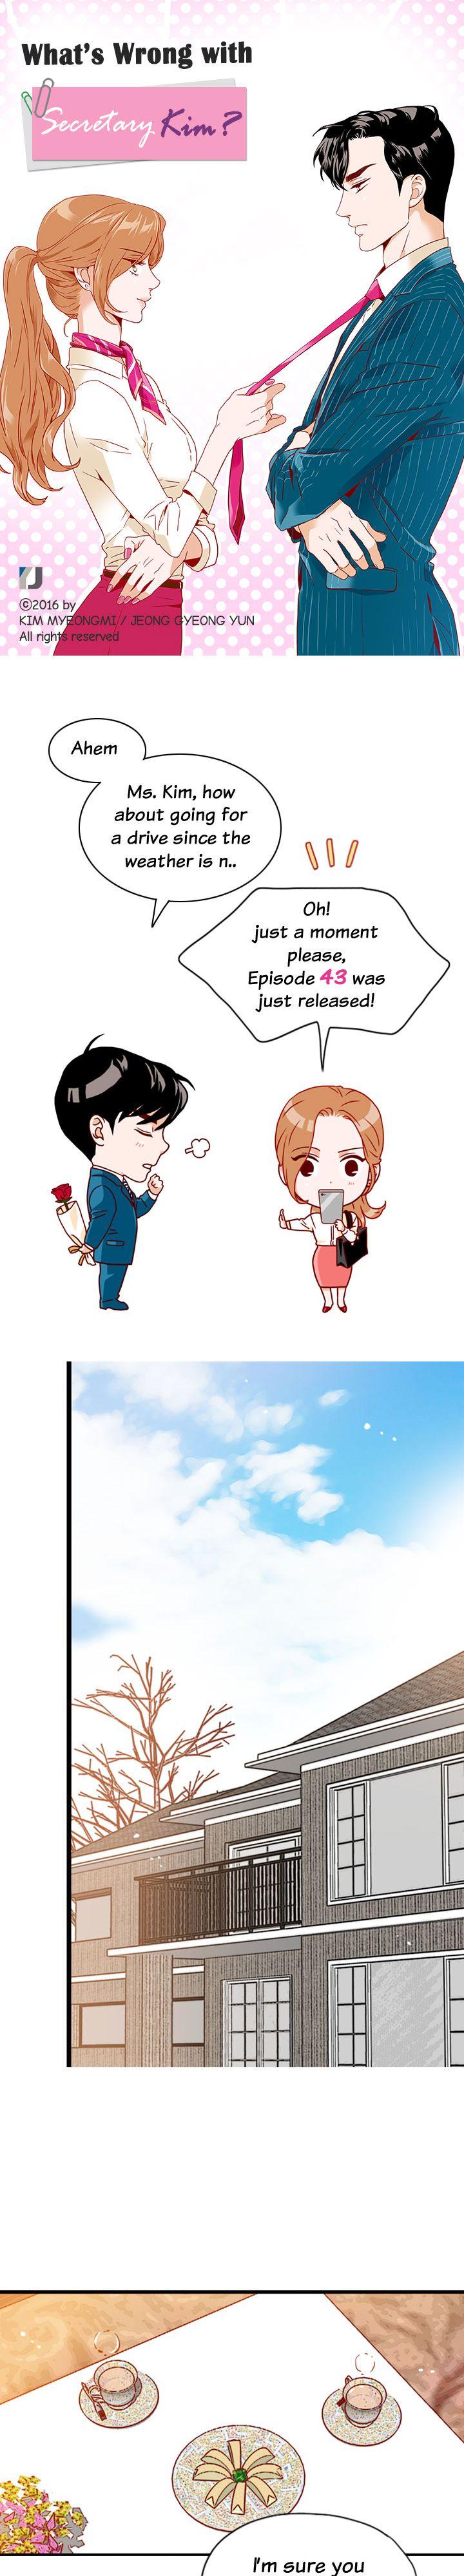 https://manga.mangadogs.com/comics/pic2/15/25807/960700/30a4b413c498af1136d7cfd906adc48b.jpg Page 1